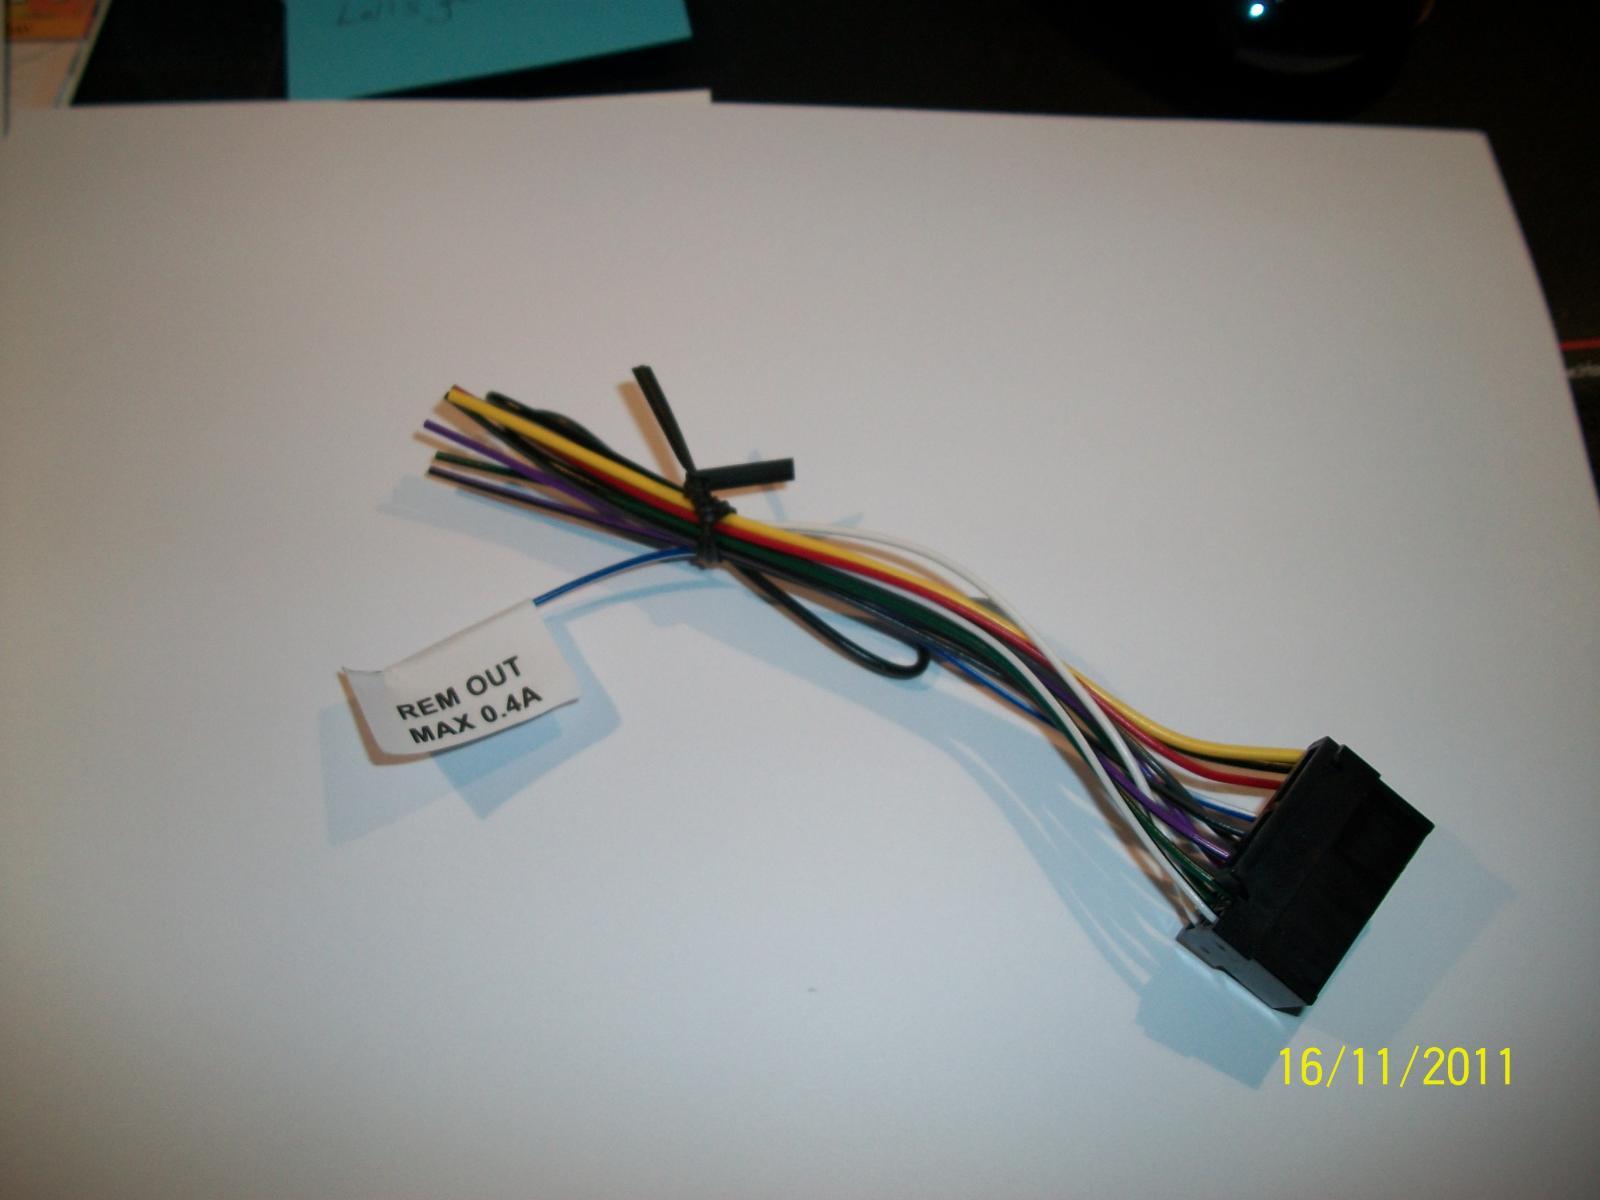 2004 hyundai sonata wiring harness aftermarket radio no sound please help hyundai forums  aftermarket radio no sound please